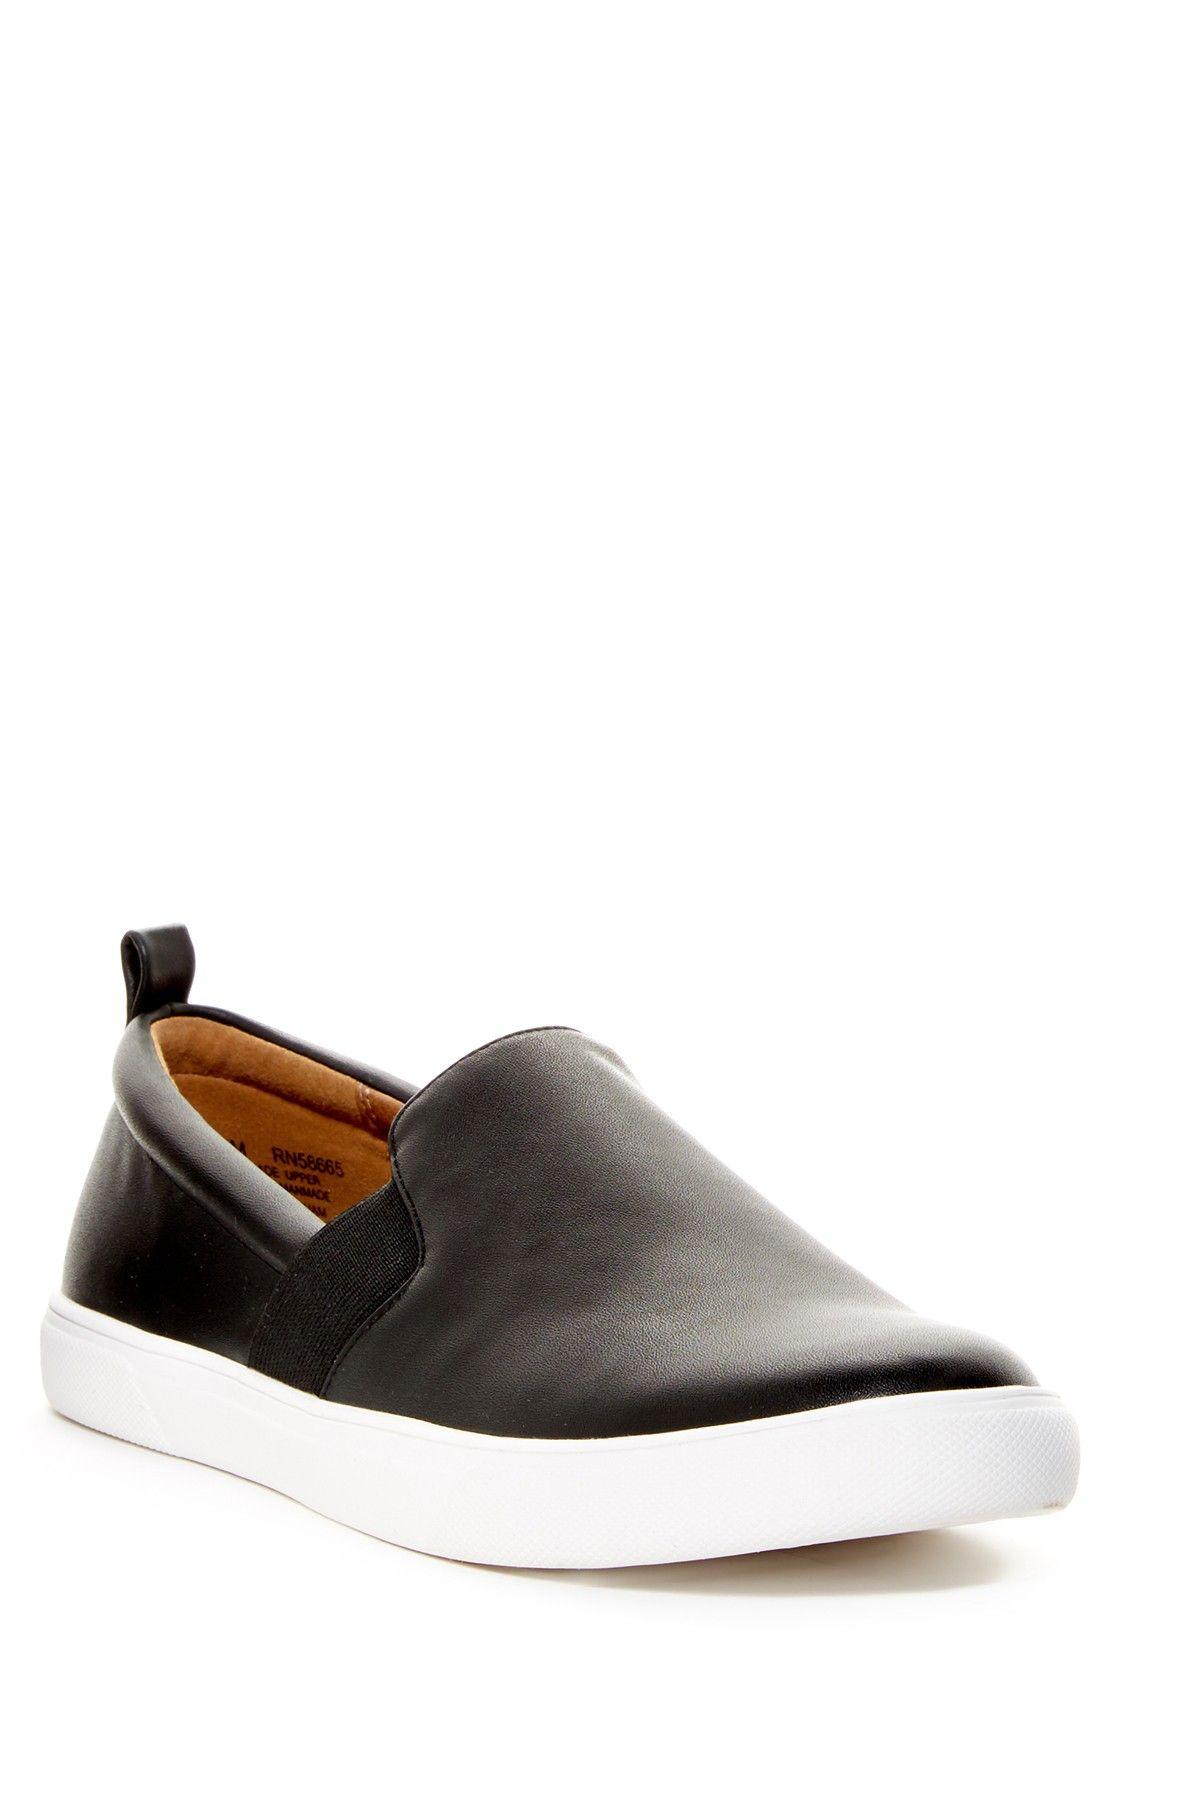 32707152818207 Noemi Slip-On Sneaker - Wide Width Available by SUSINA on  nordstrom rack